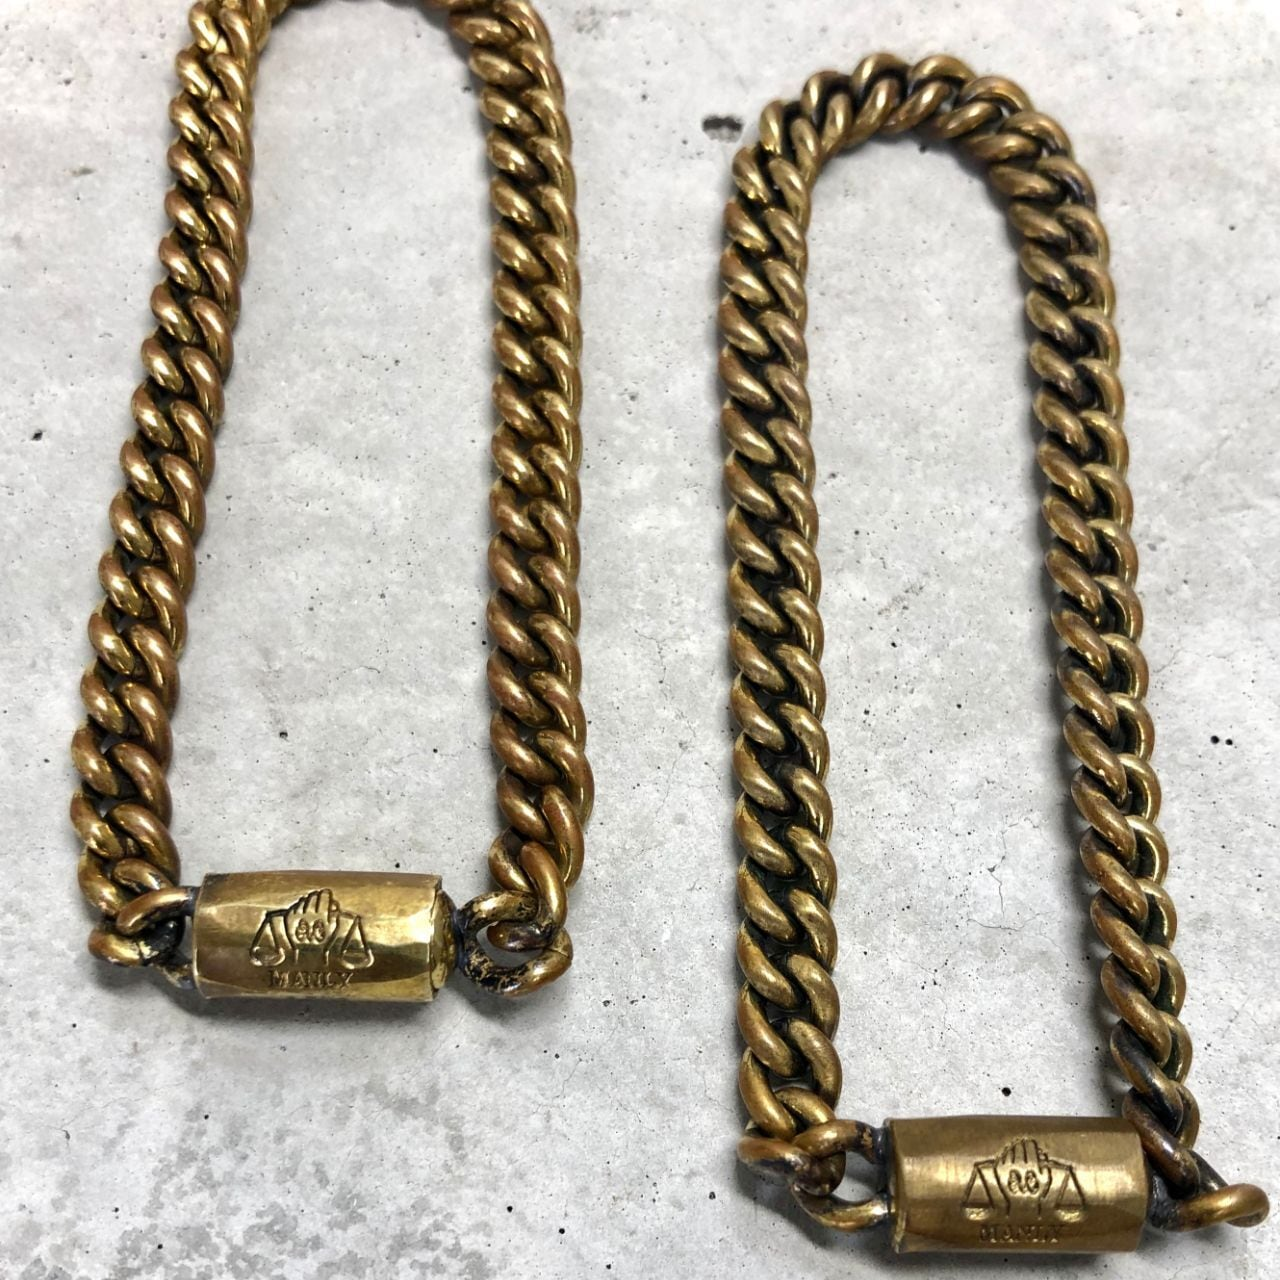 【MB-1BR】Kihei's short pitch chain Icon bracelet